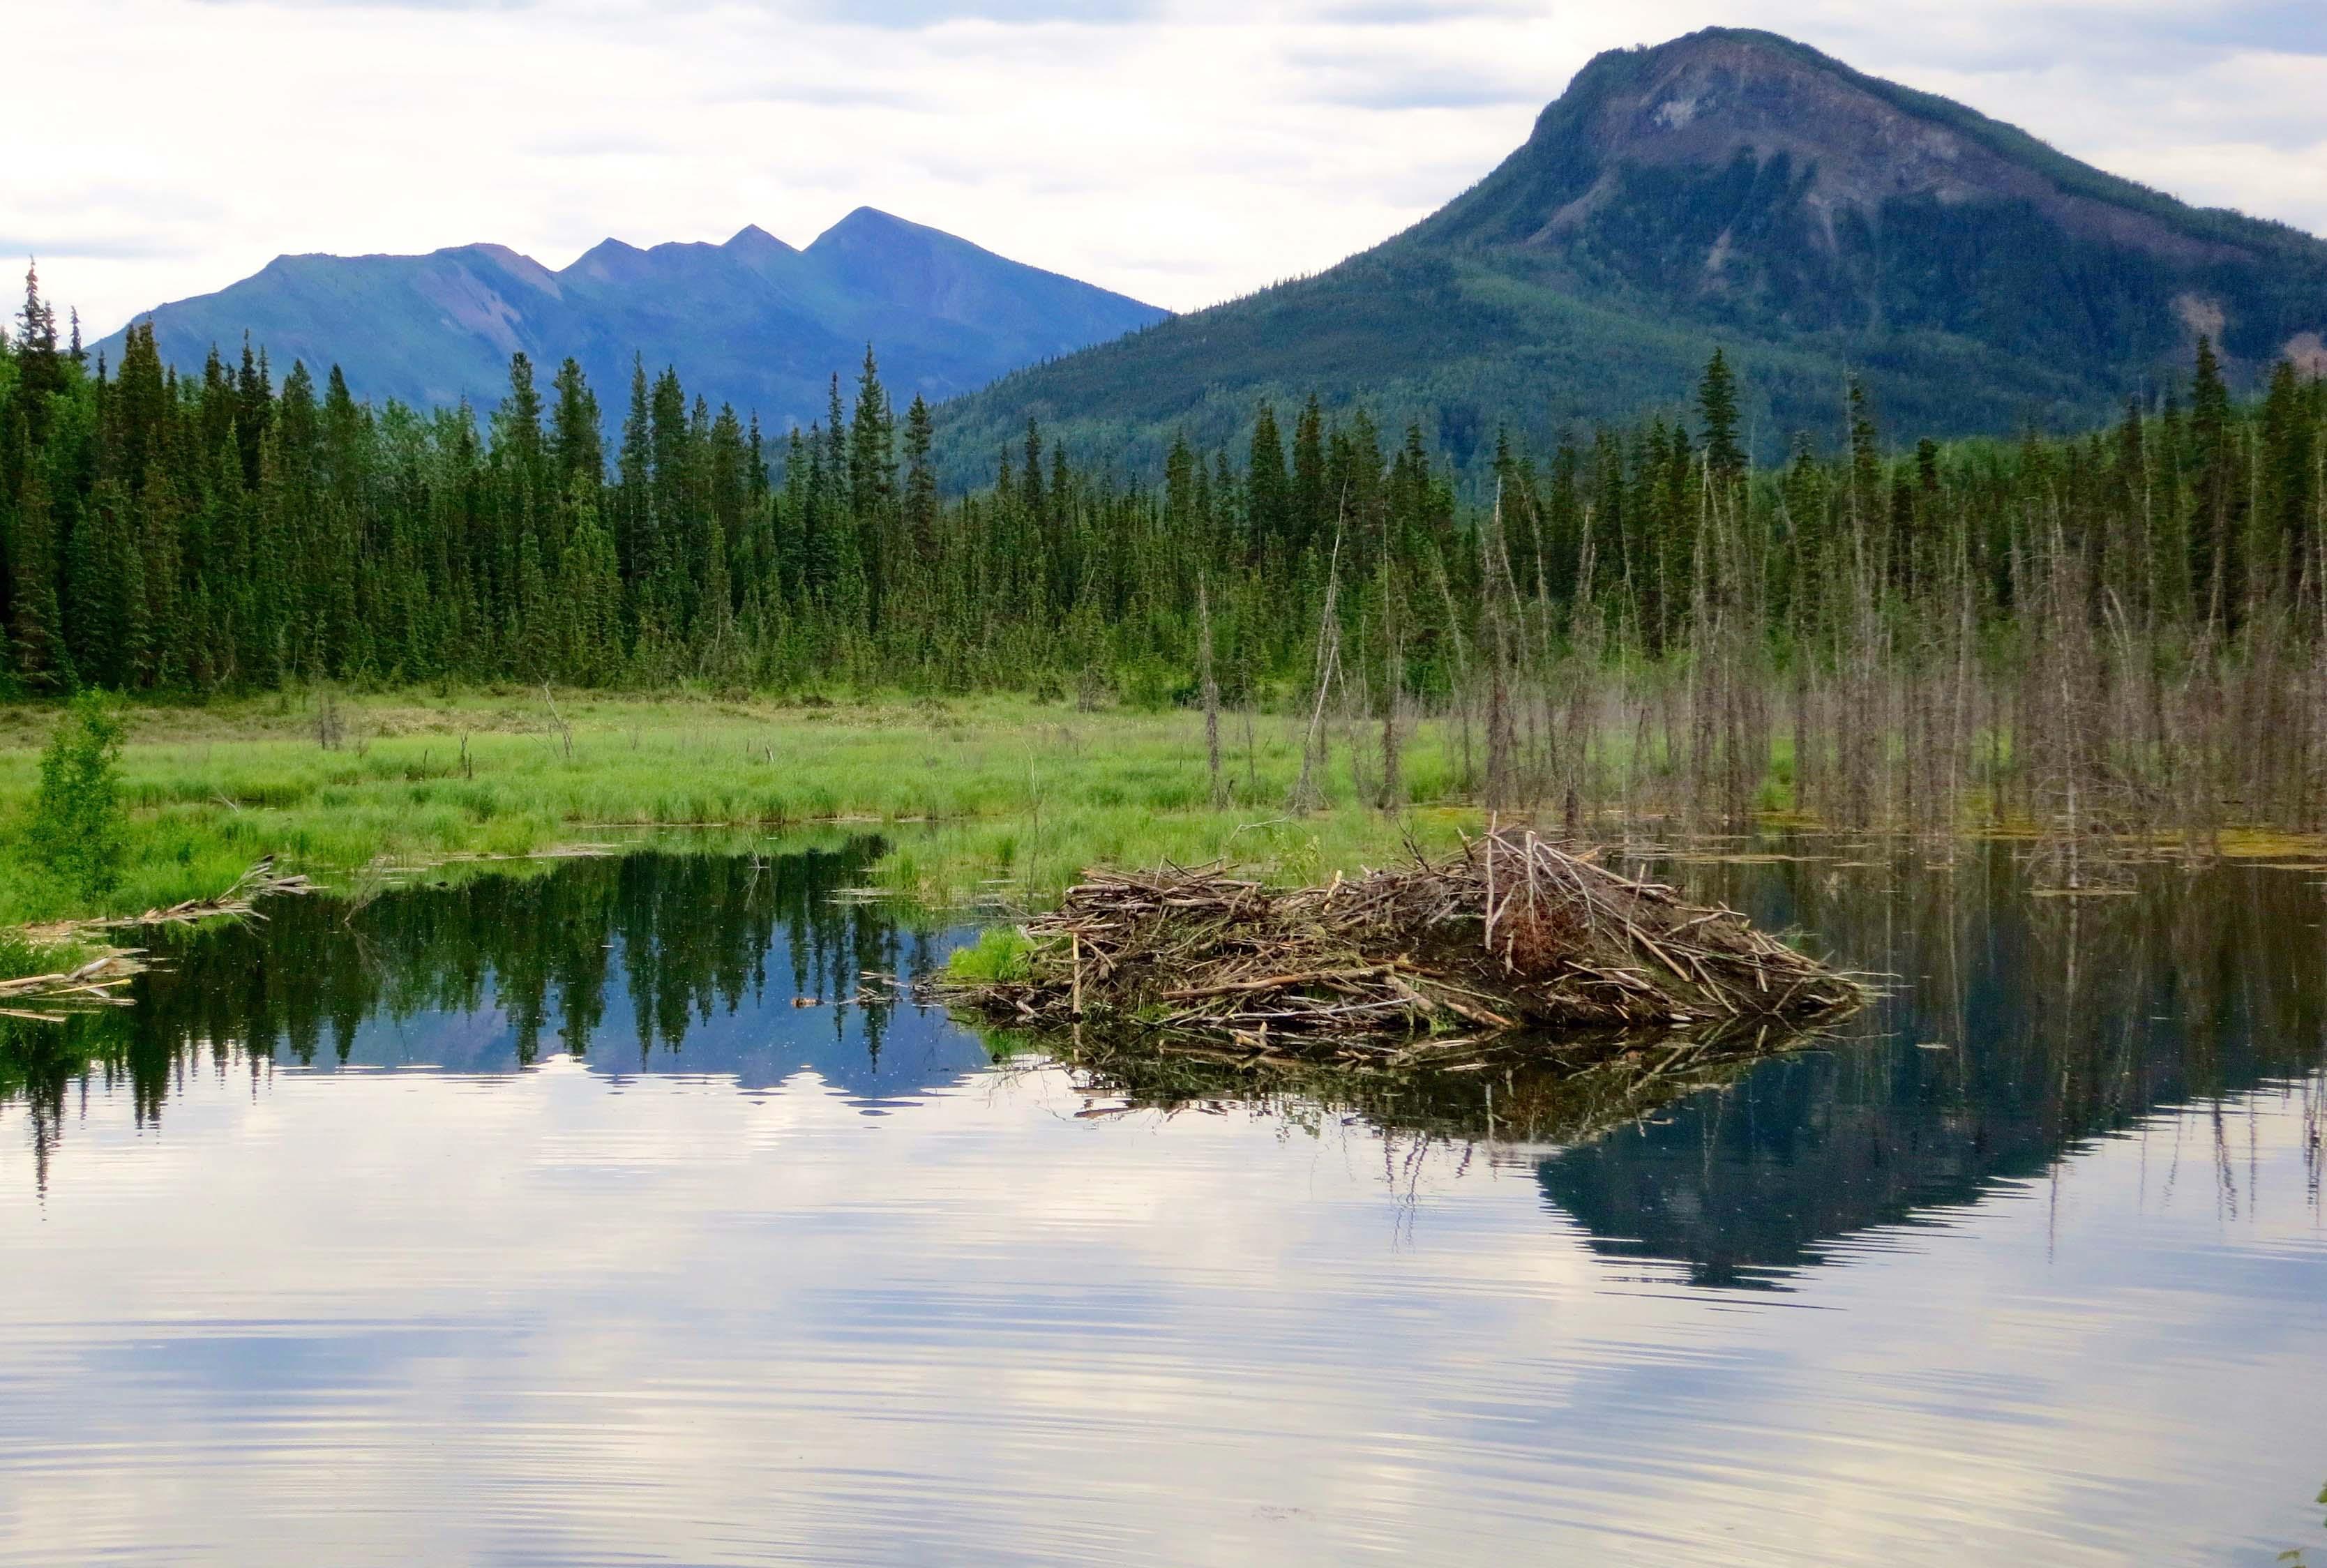 Beaver dam near the Toad River along the Alaska Highway